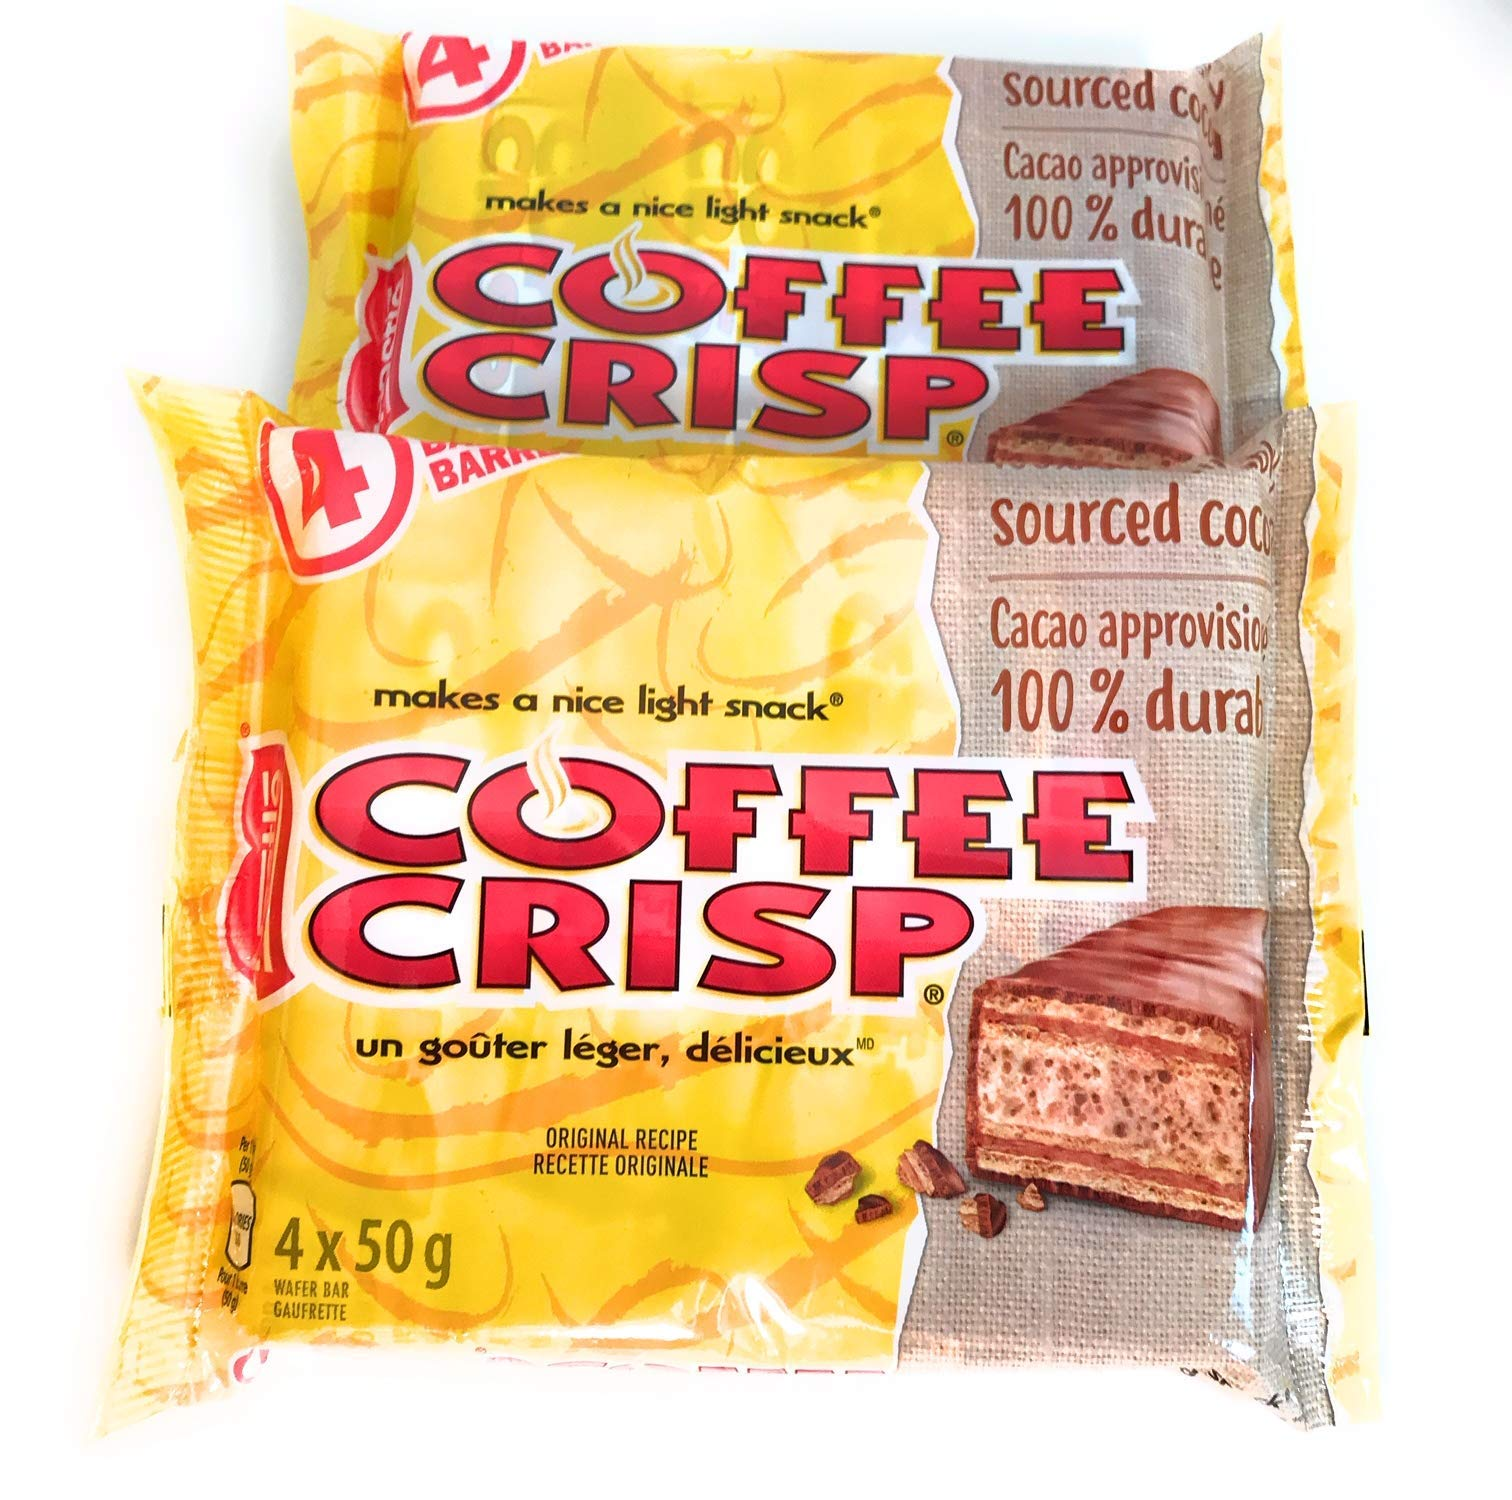 Nestle Coffee Crisp Chocolate Bars 2 pack, 8-50g Bars in Total